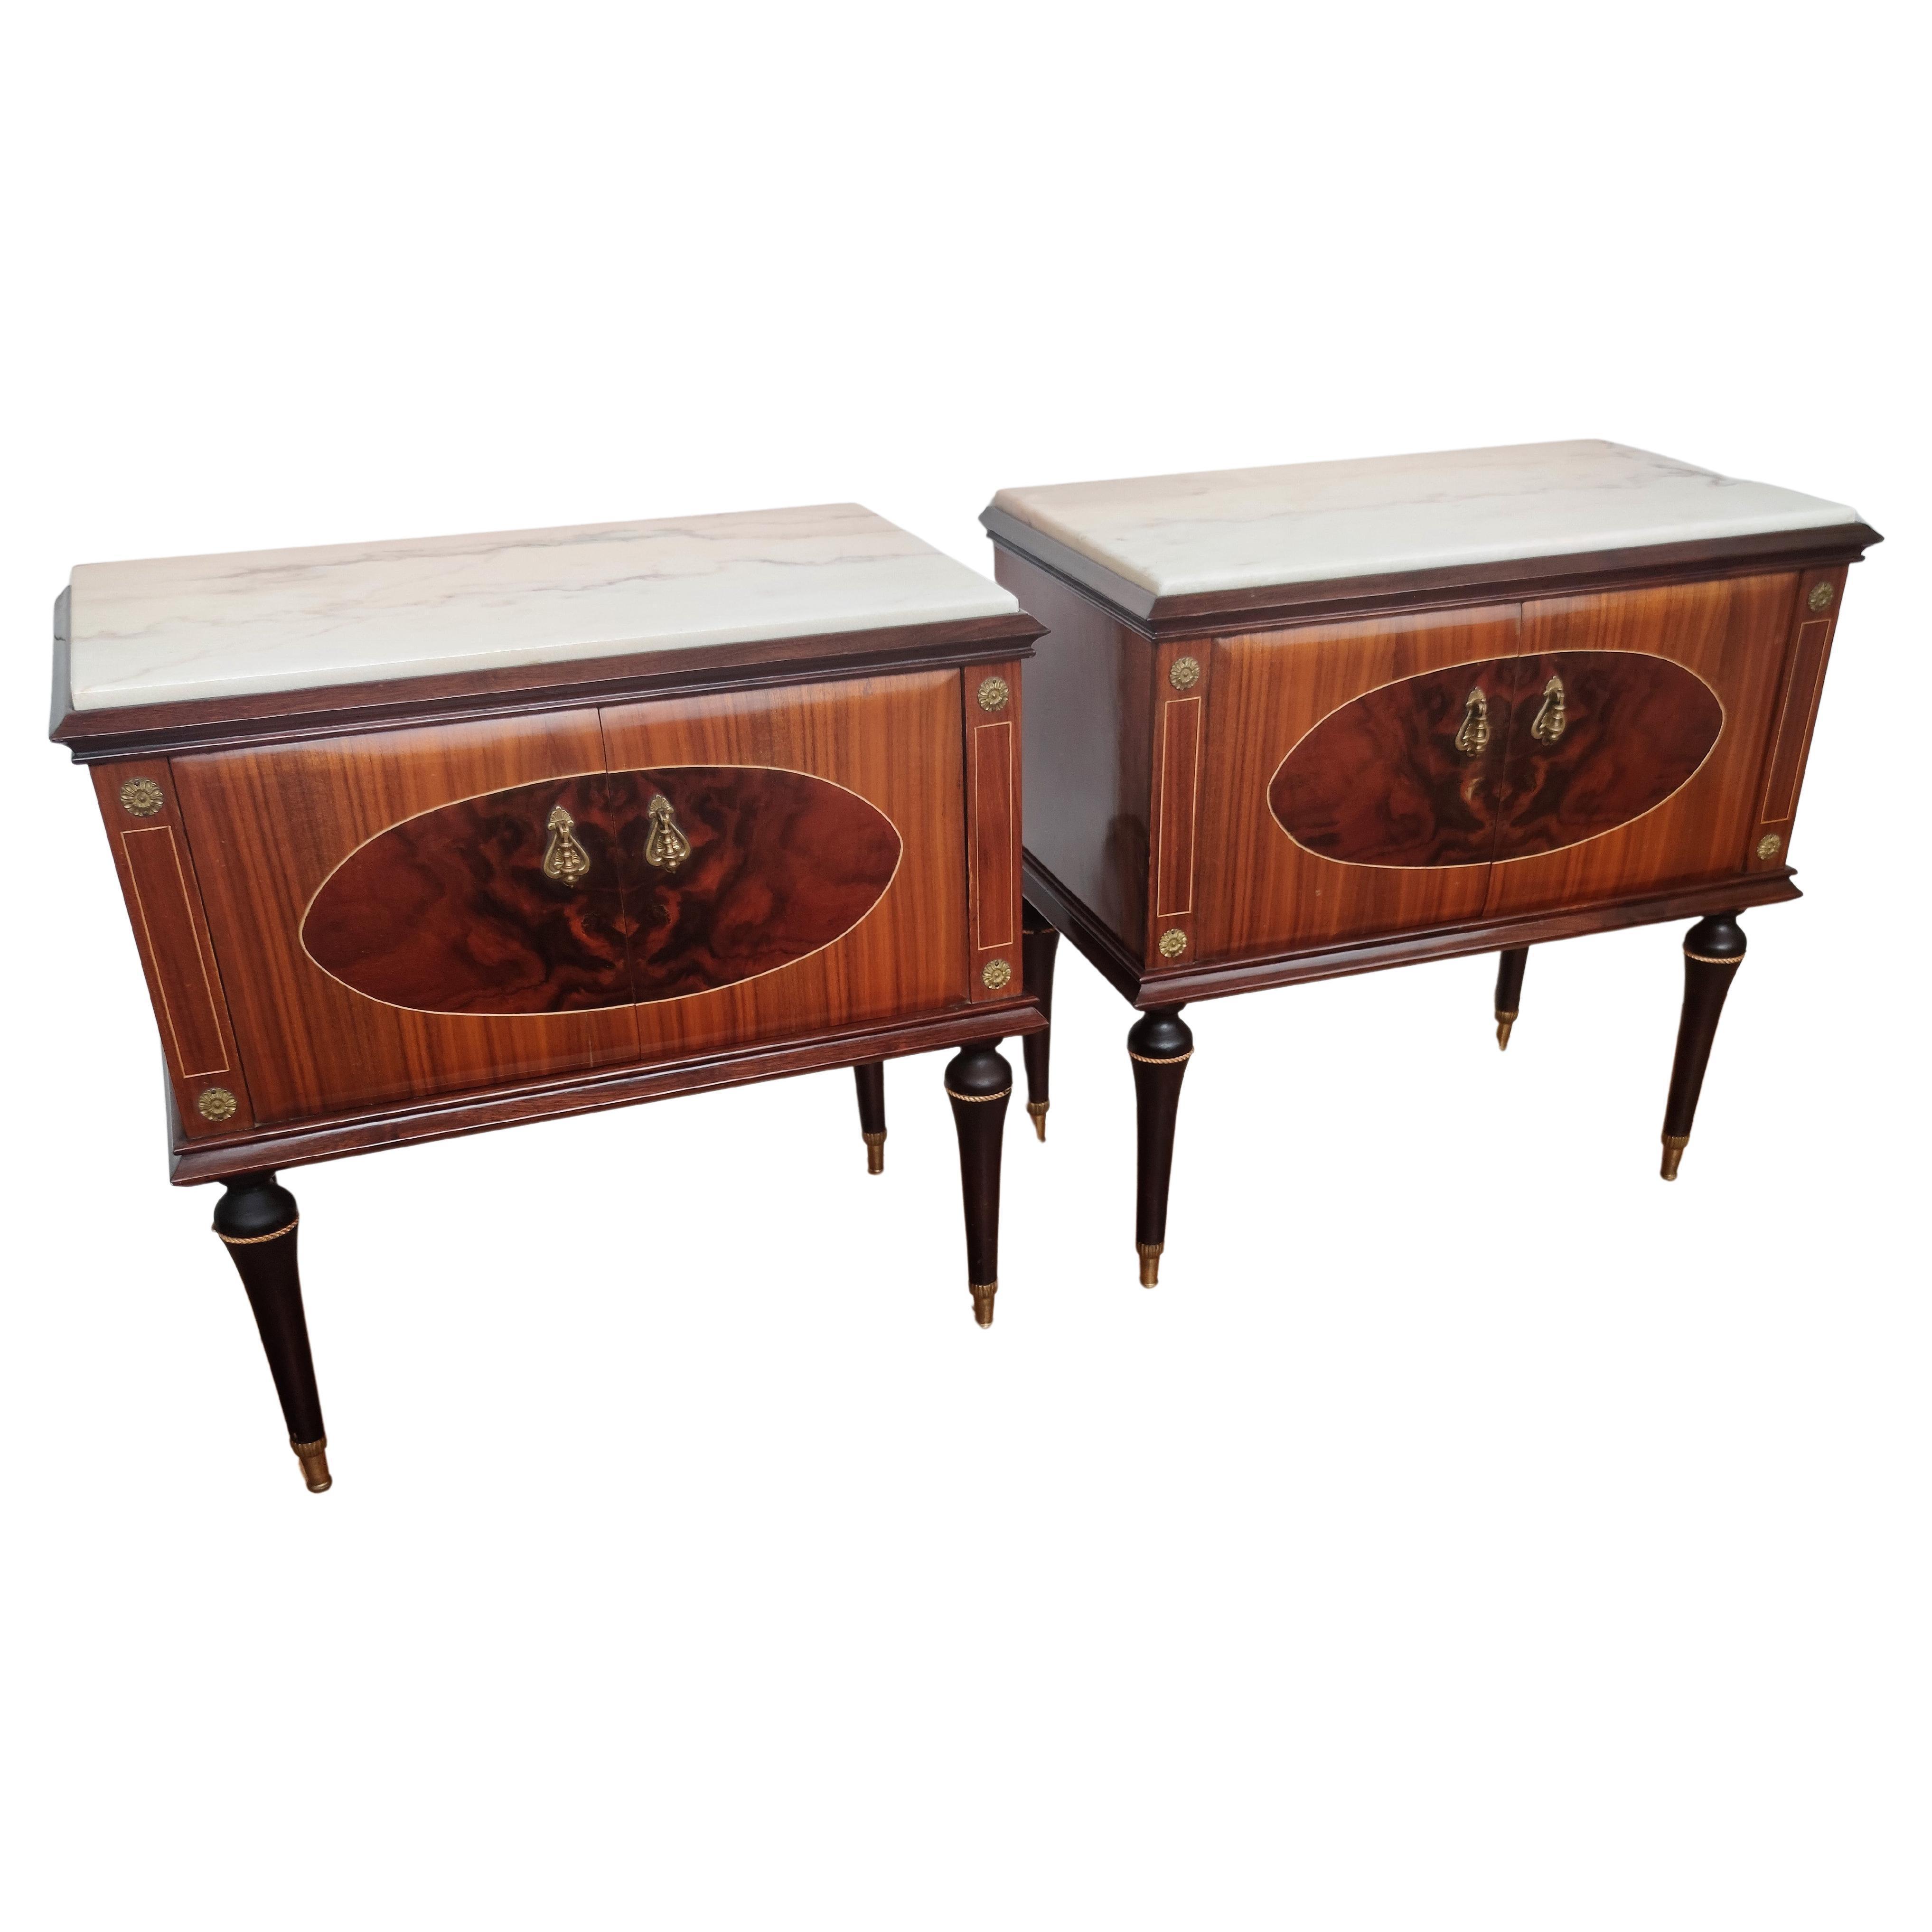 Pair of Italian Midcentury Art Deco Nightstands Bedside Tables Walnut Marble Top